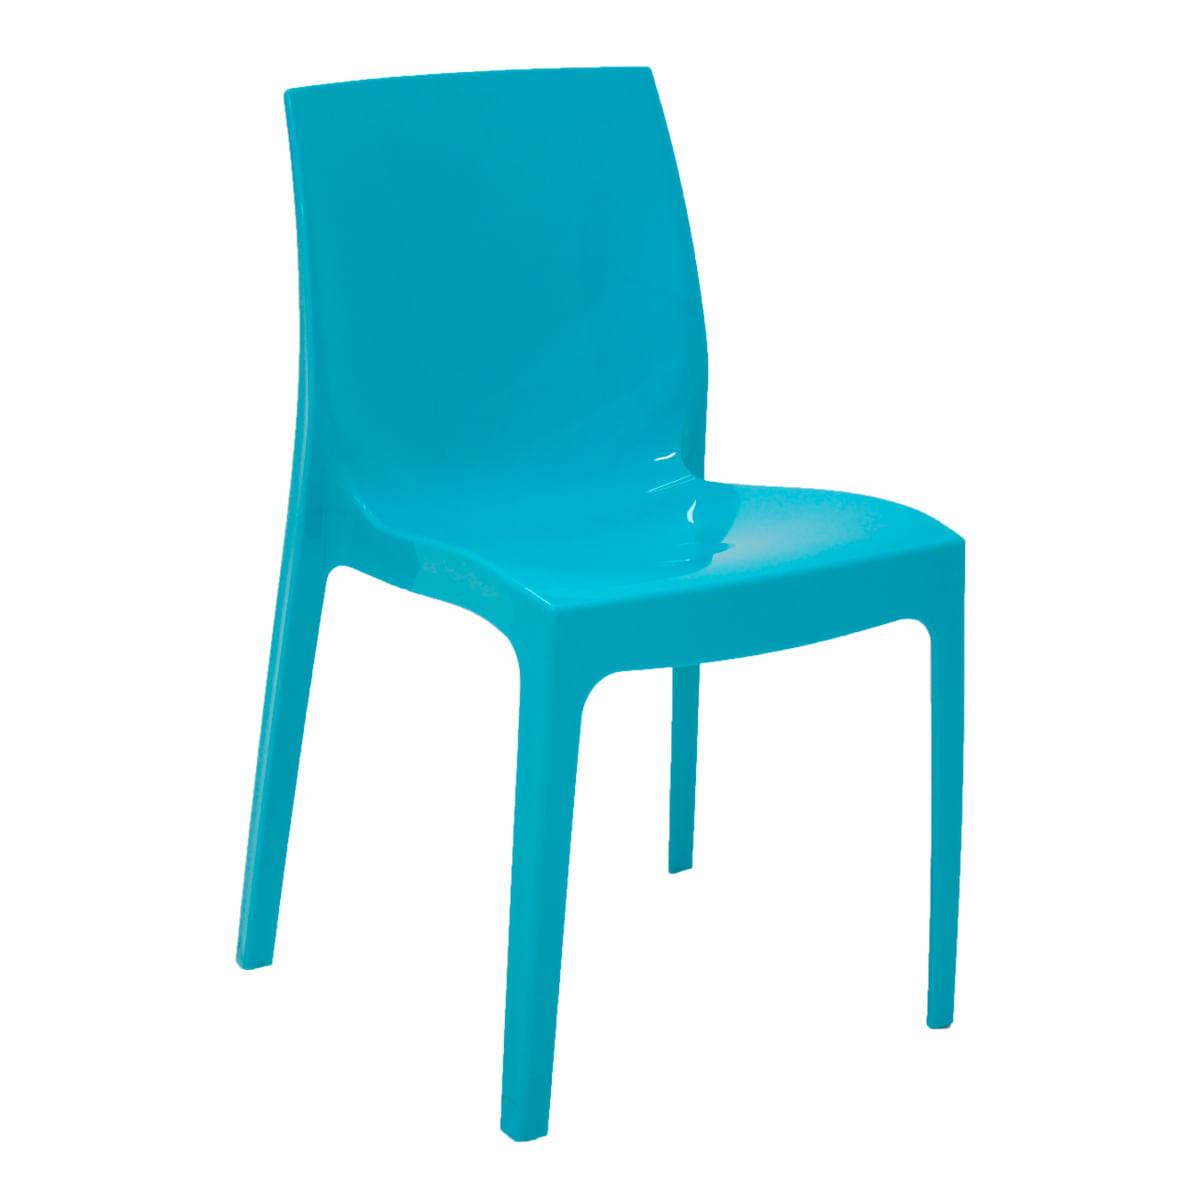 Cadeira Tramontina Alice Polida em Polipropileno Azul